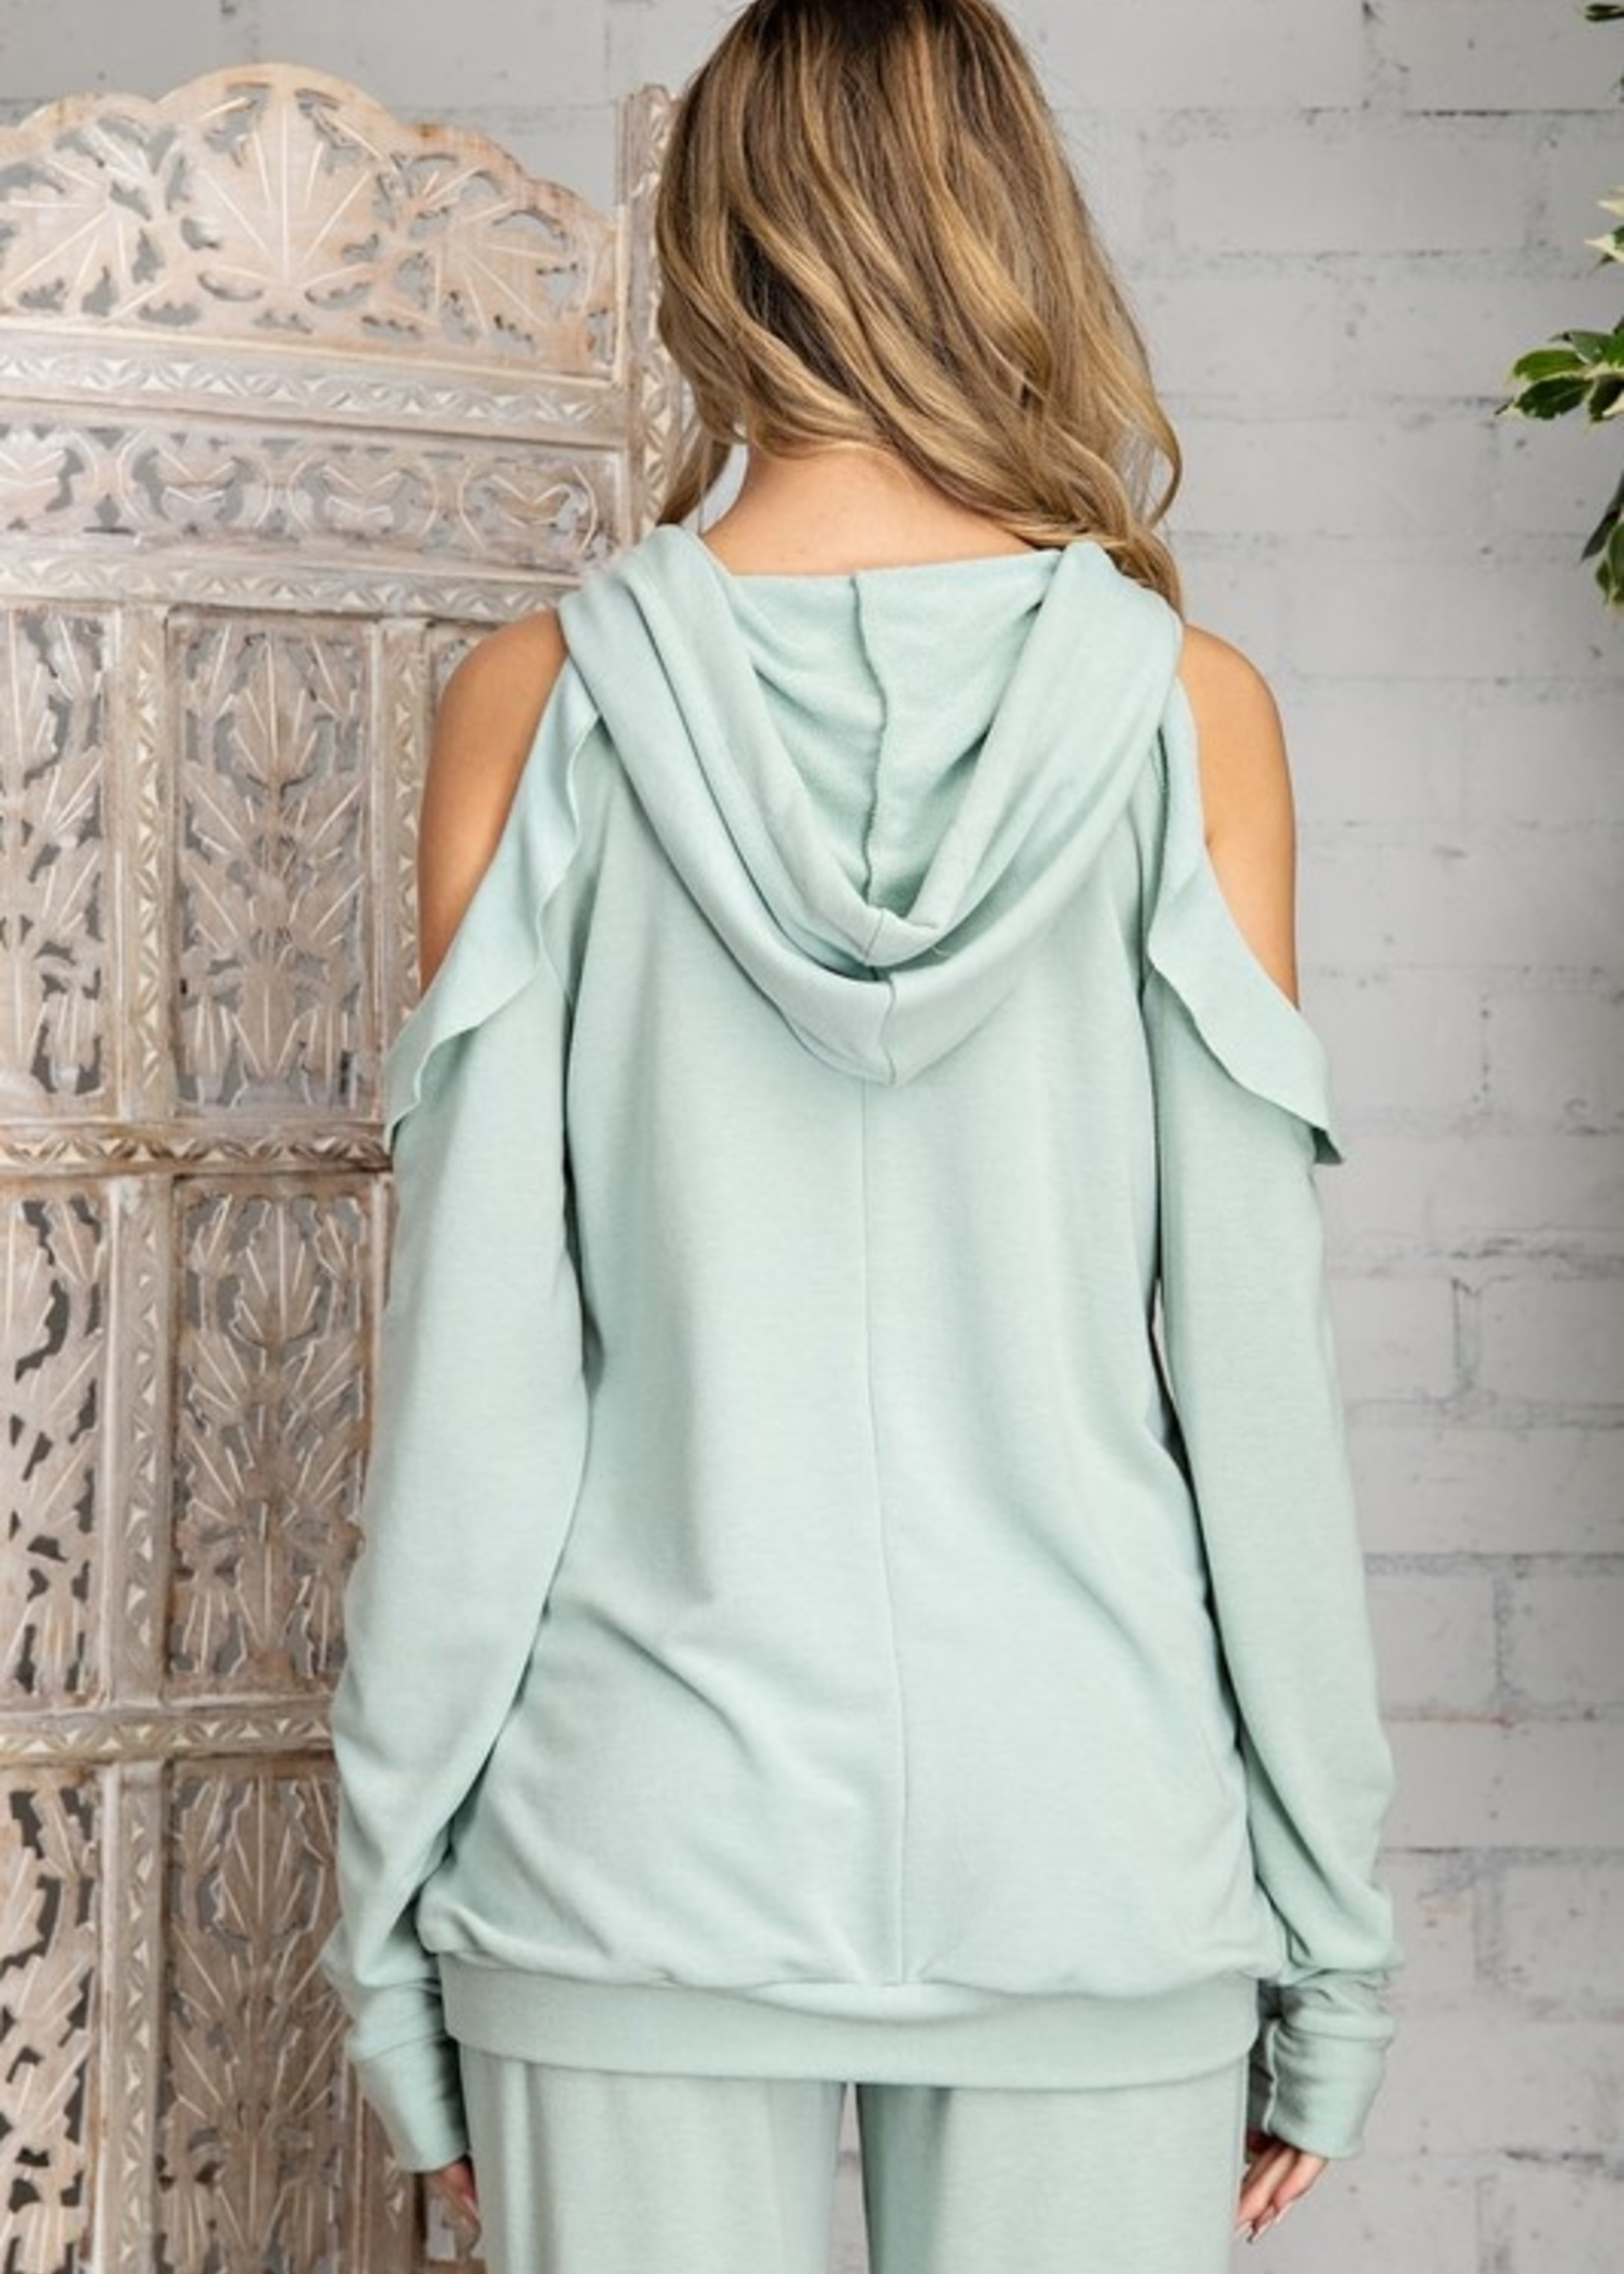 Ruffled cold shoulder top